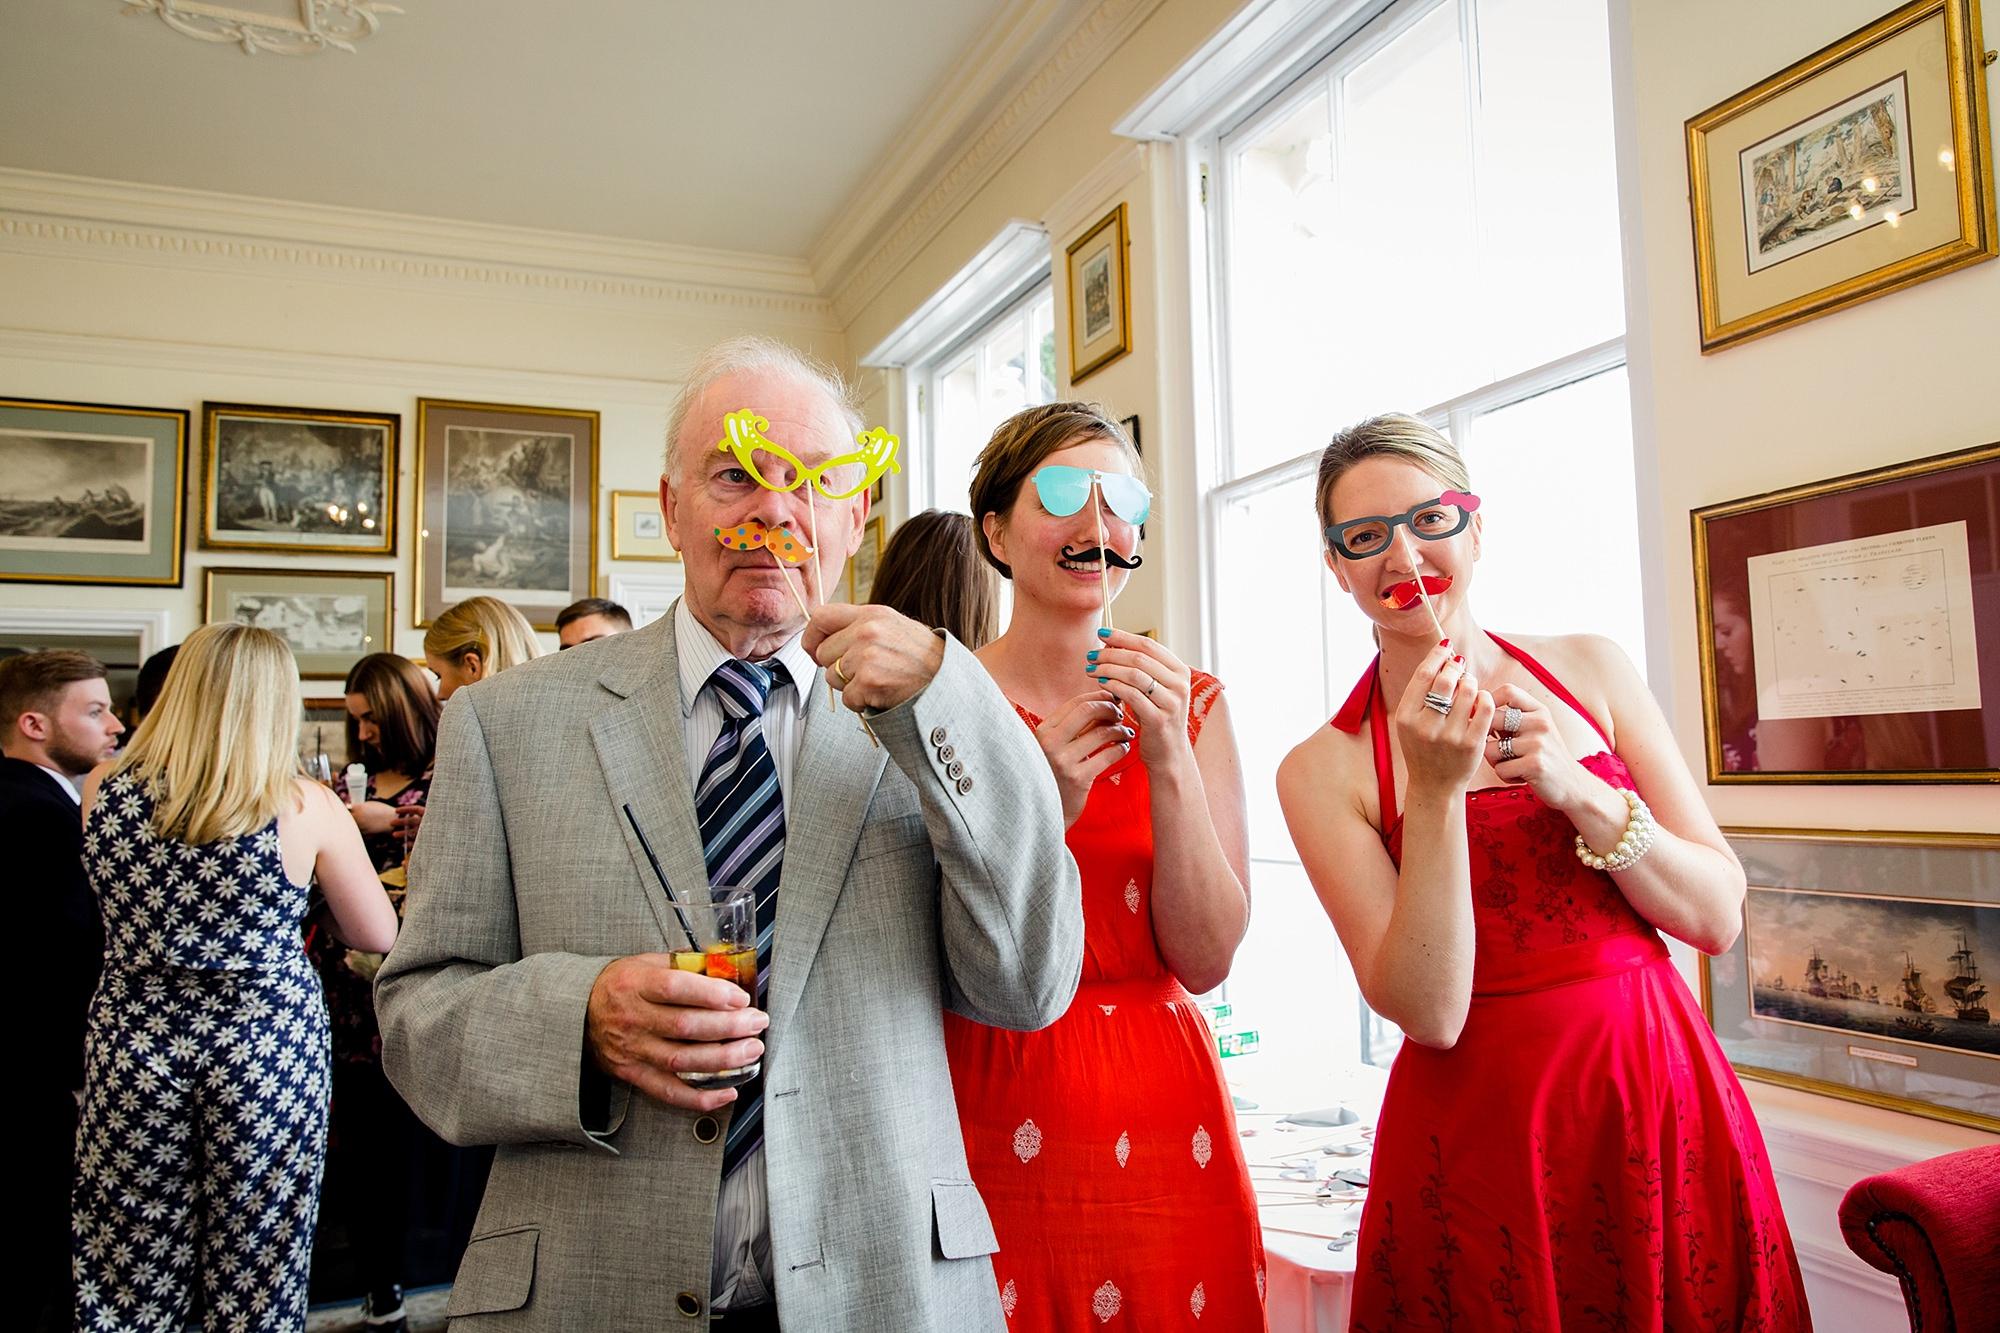 Trafalgar Tavern wedding guests with photo props